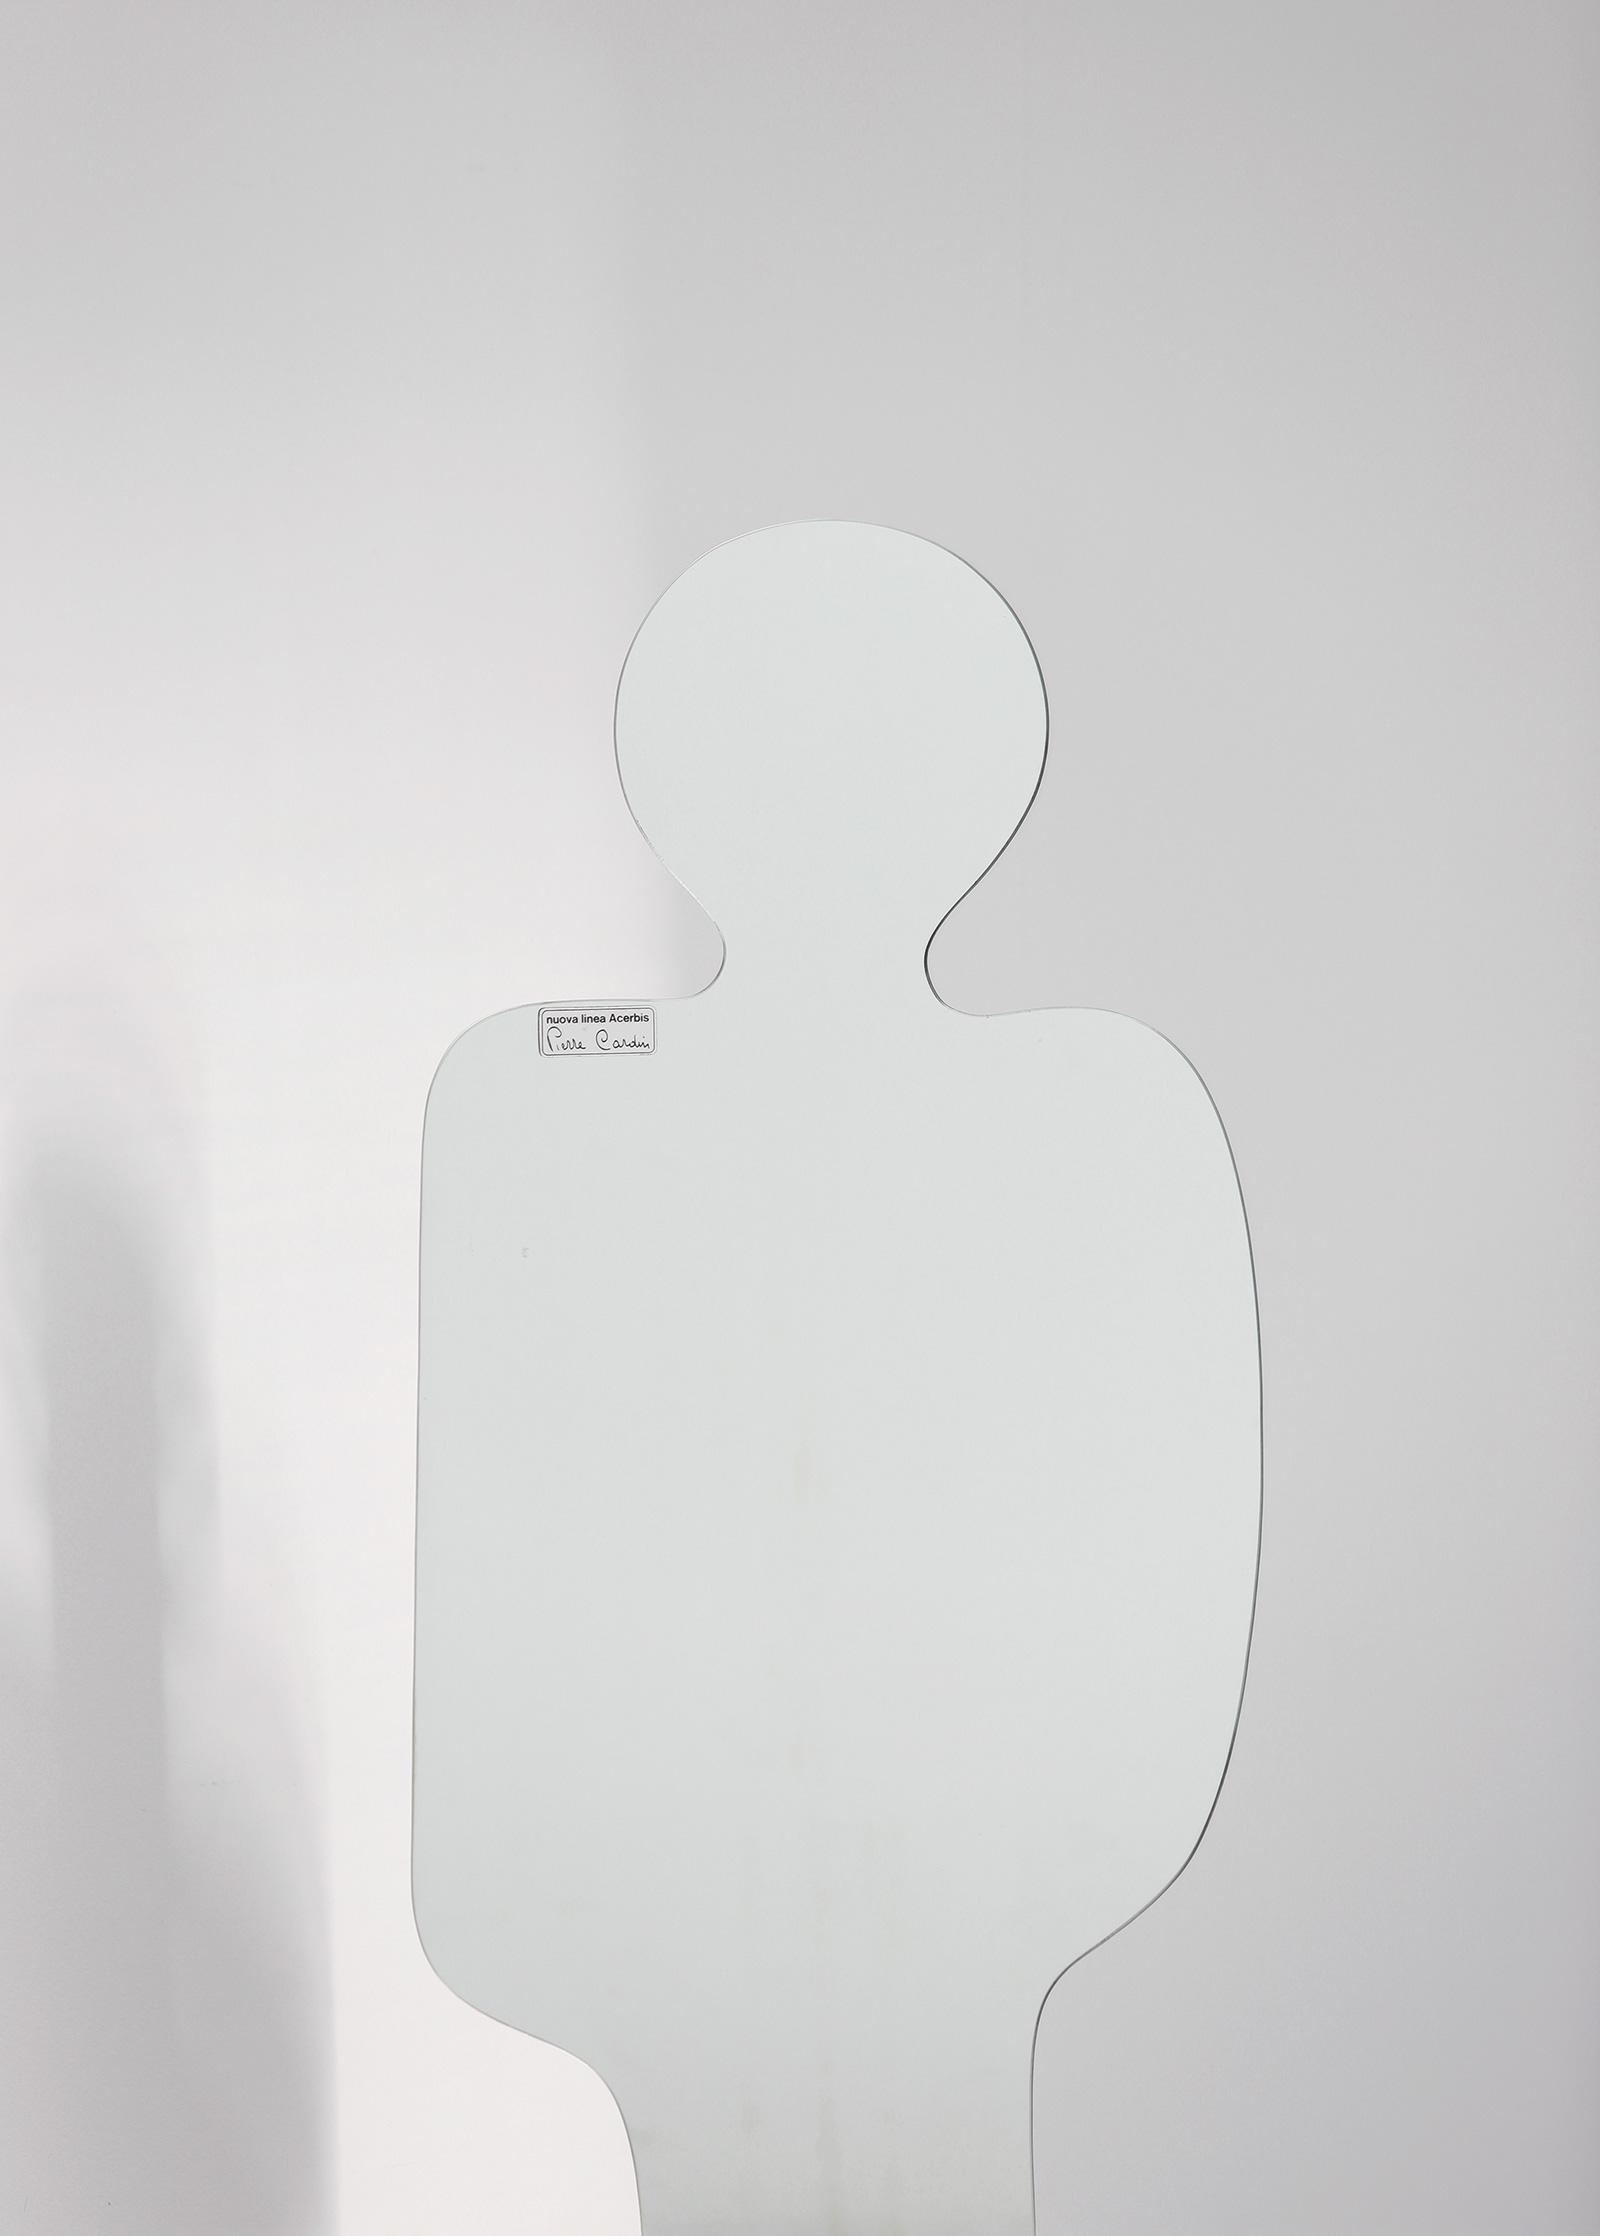 Pierre Cardin Silhouette shaped mirrorimage 4